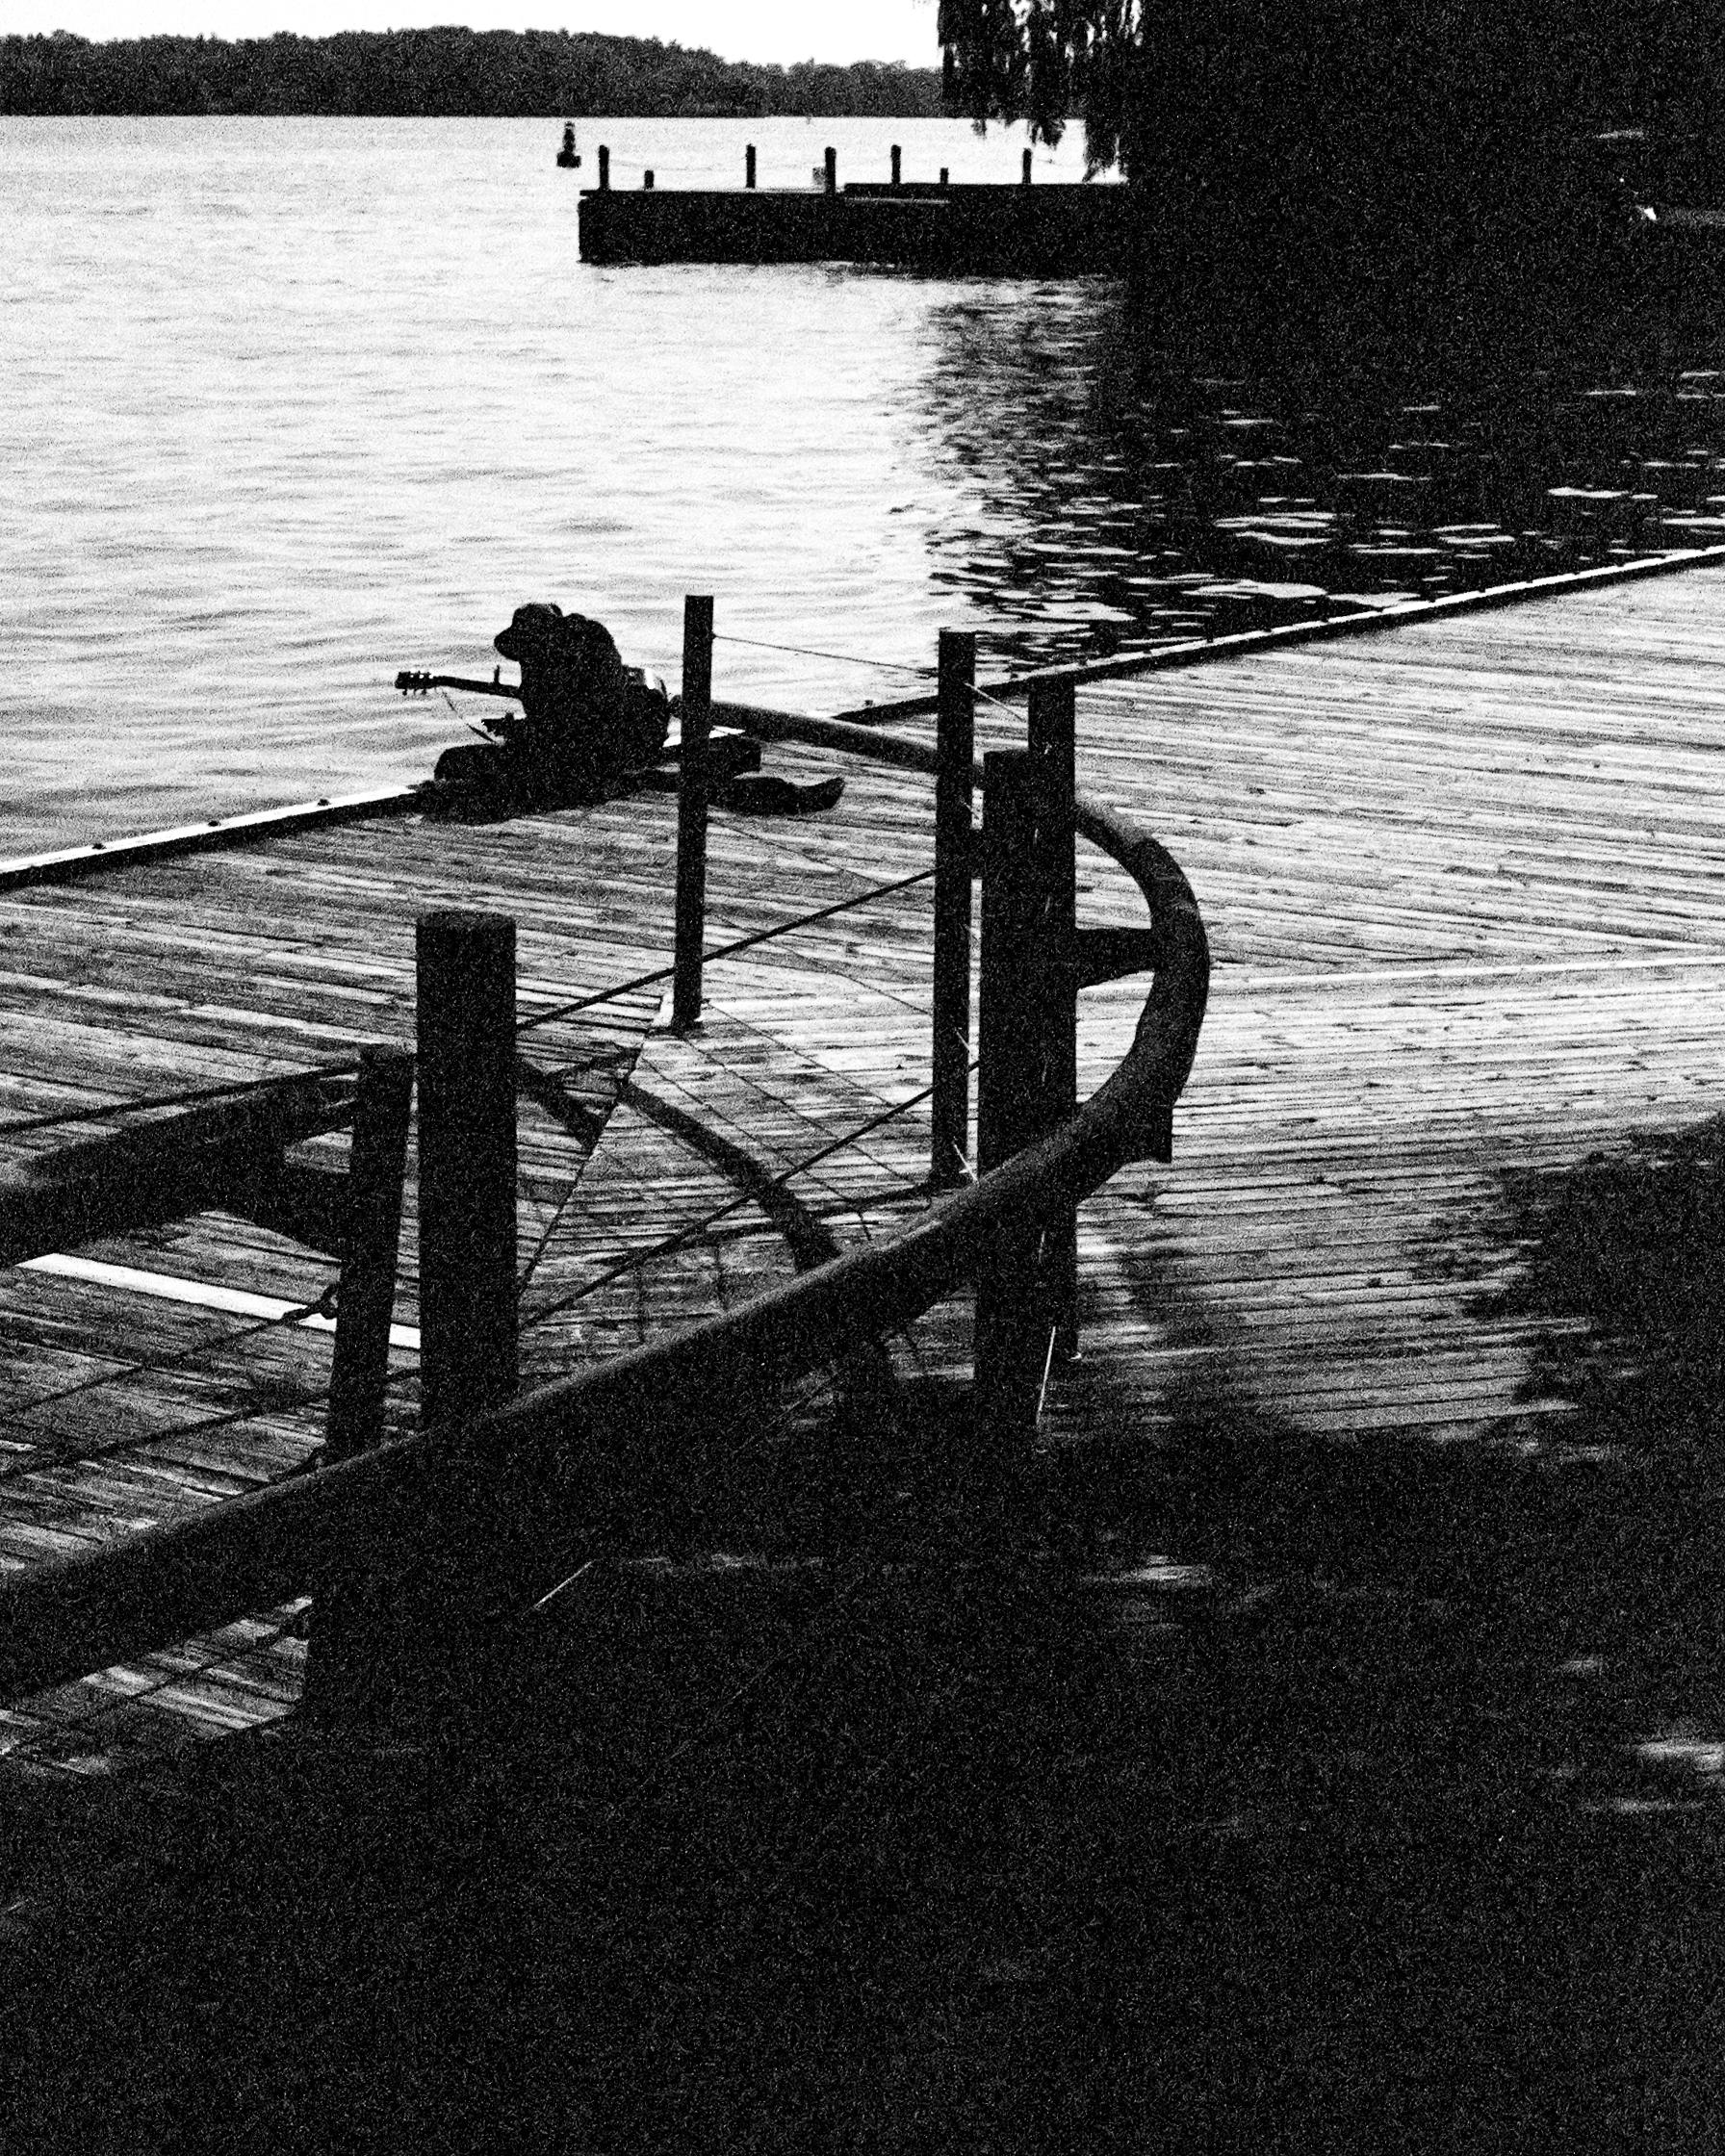 In Shadows 3 by Sebastien Duff-Maill